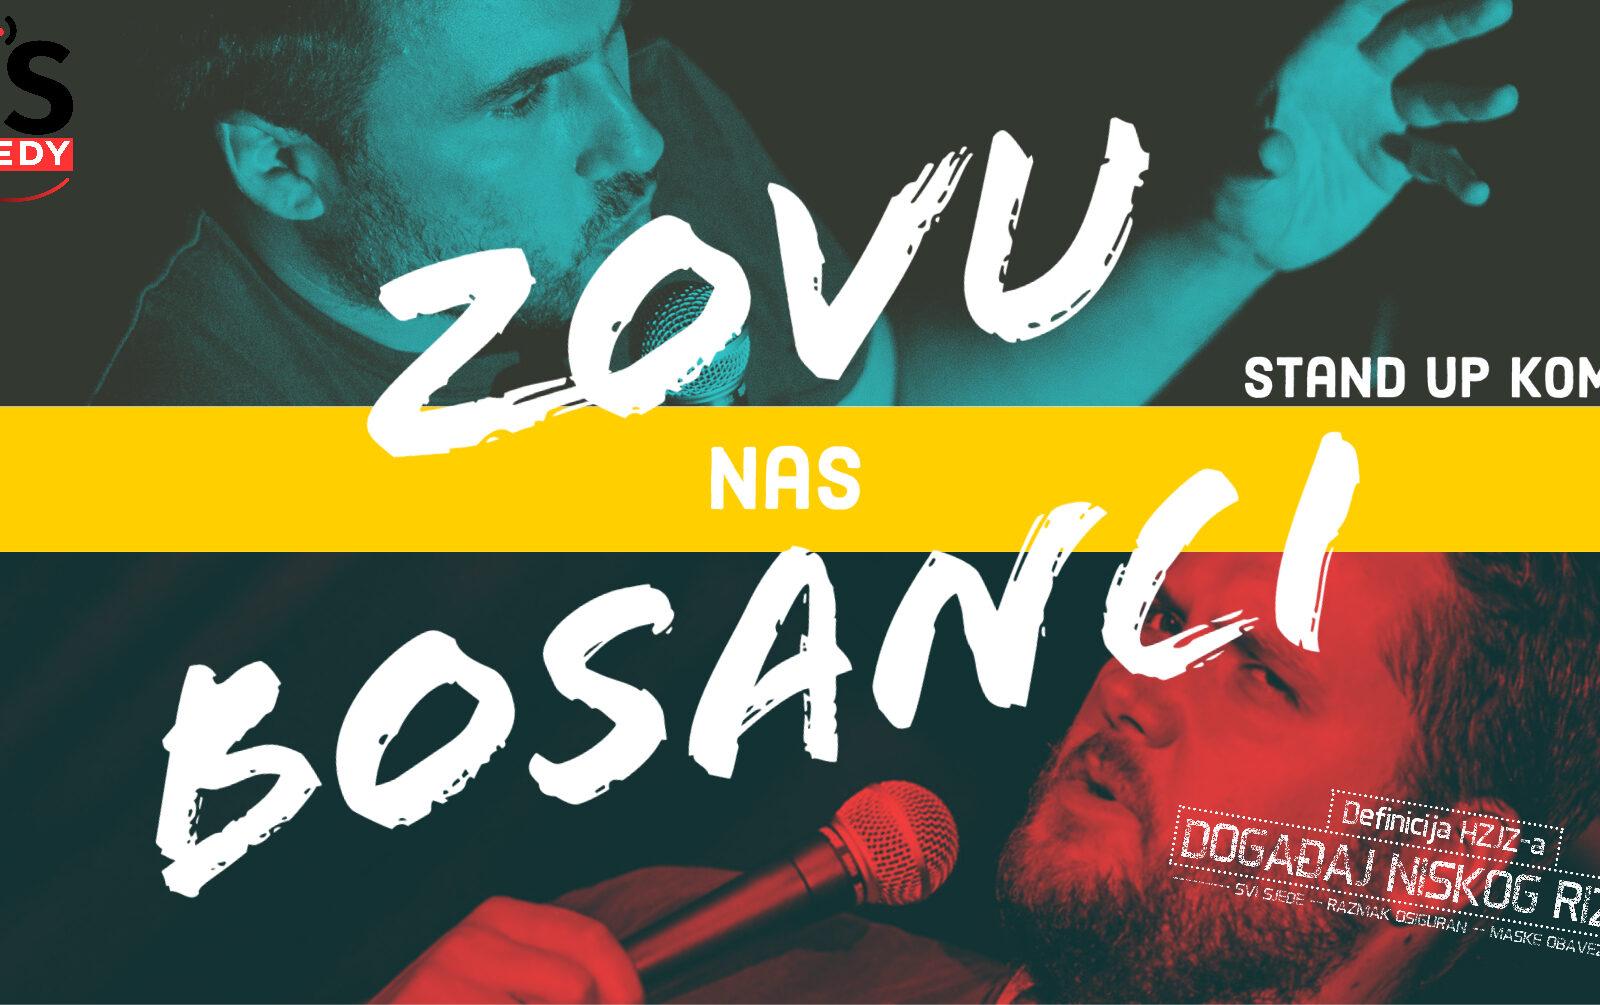 ZOVU NAS BOSANCI, stand up comedy show